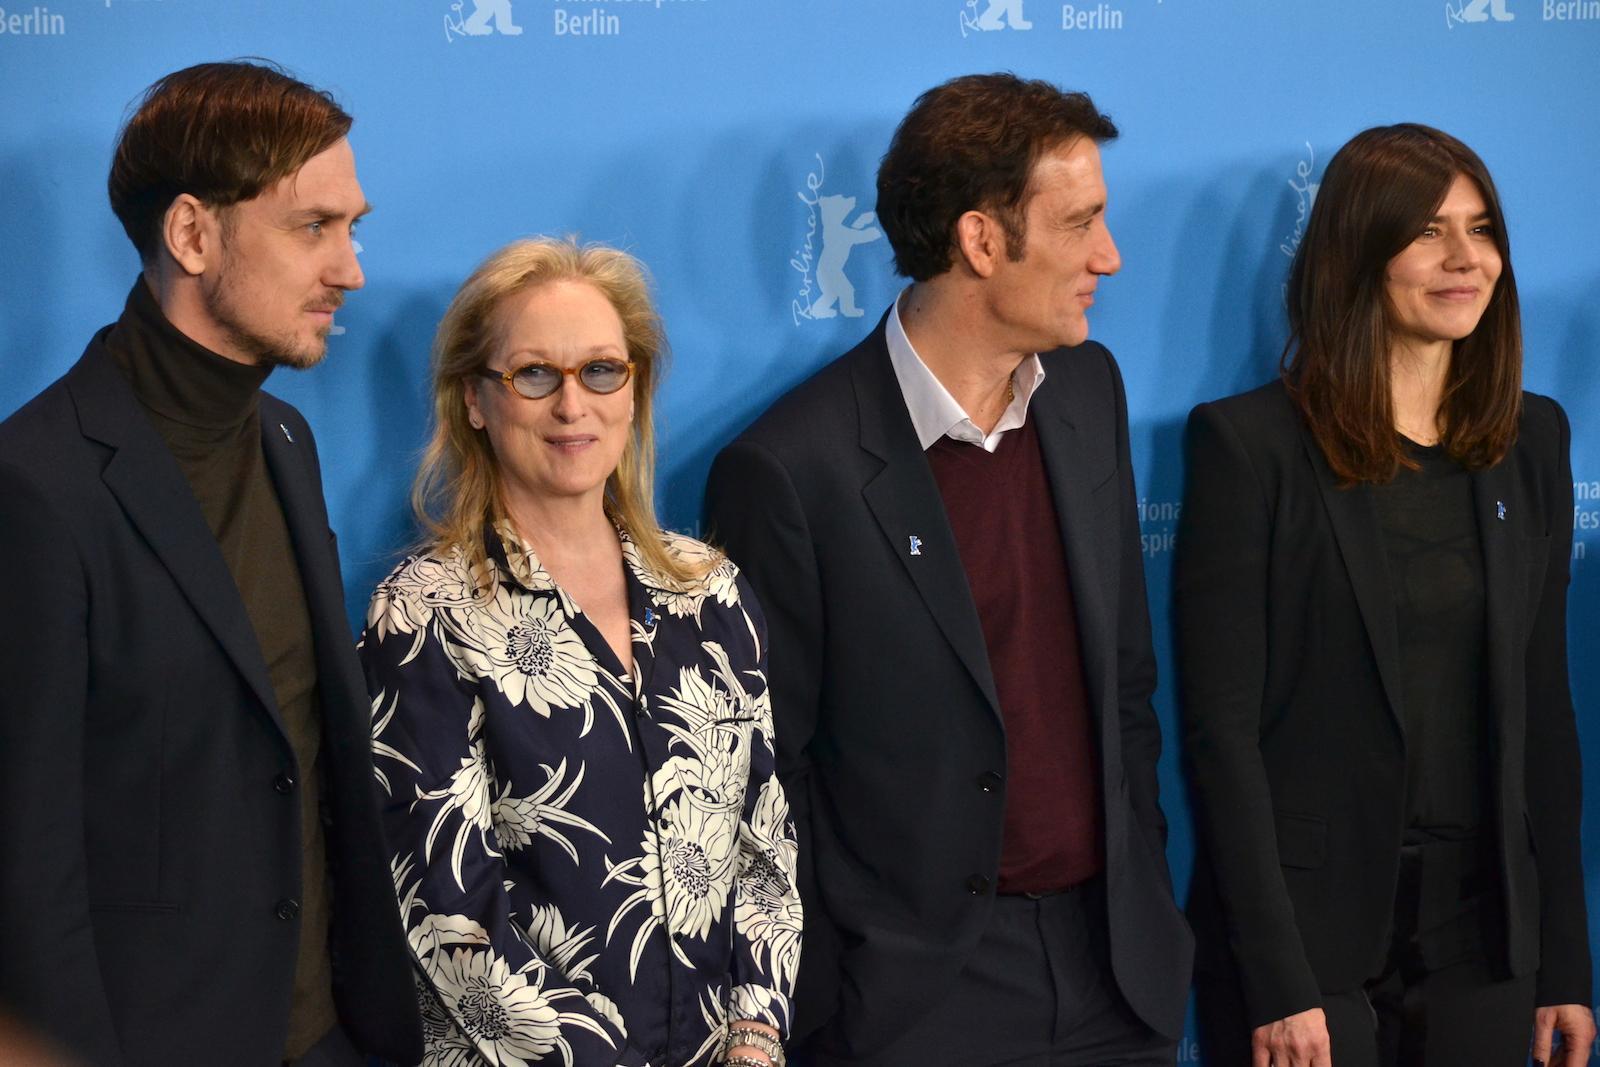 Berlino 2016:Meryl Streep, Clive Owen, Lars Eidinger, Małgorzata Szumowska al photocall della giuria